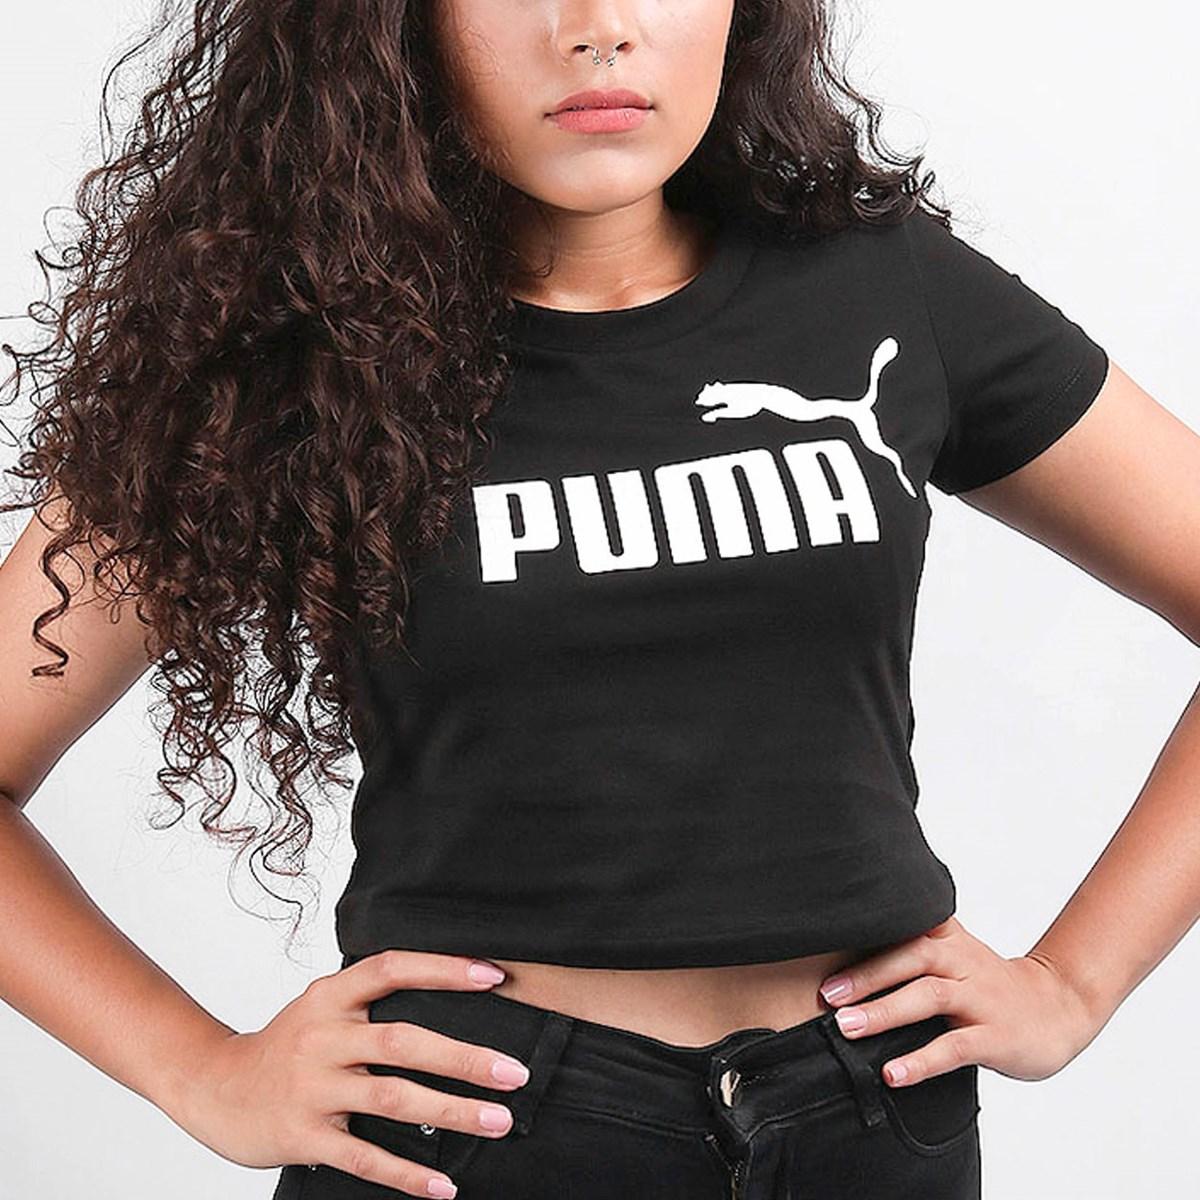 Camiseta Puma Feminina Cropped ESS+ Fitted Tee Black 58139801 Black